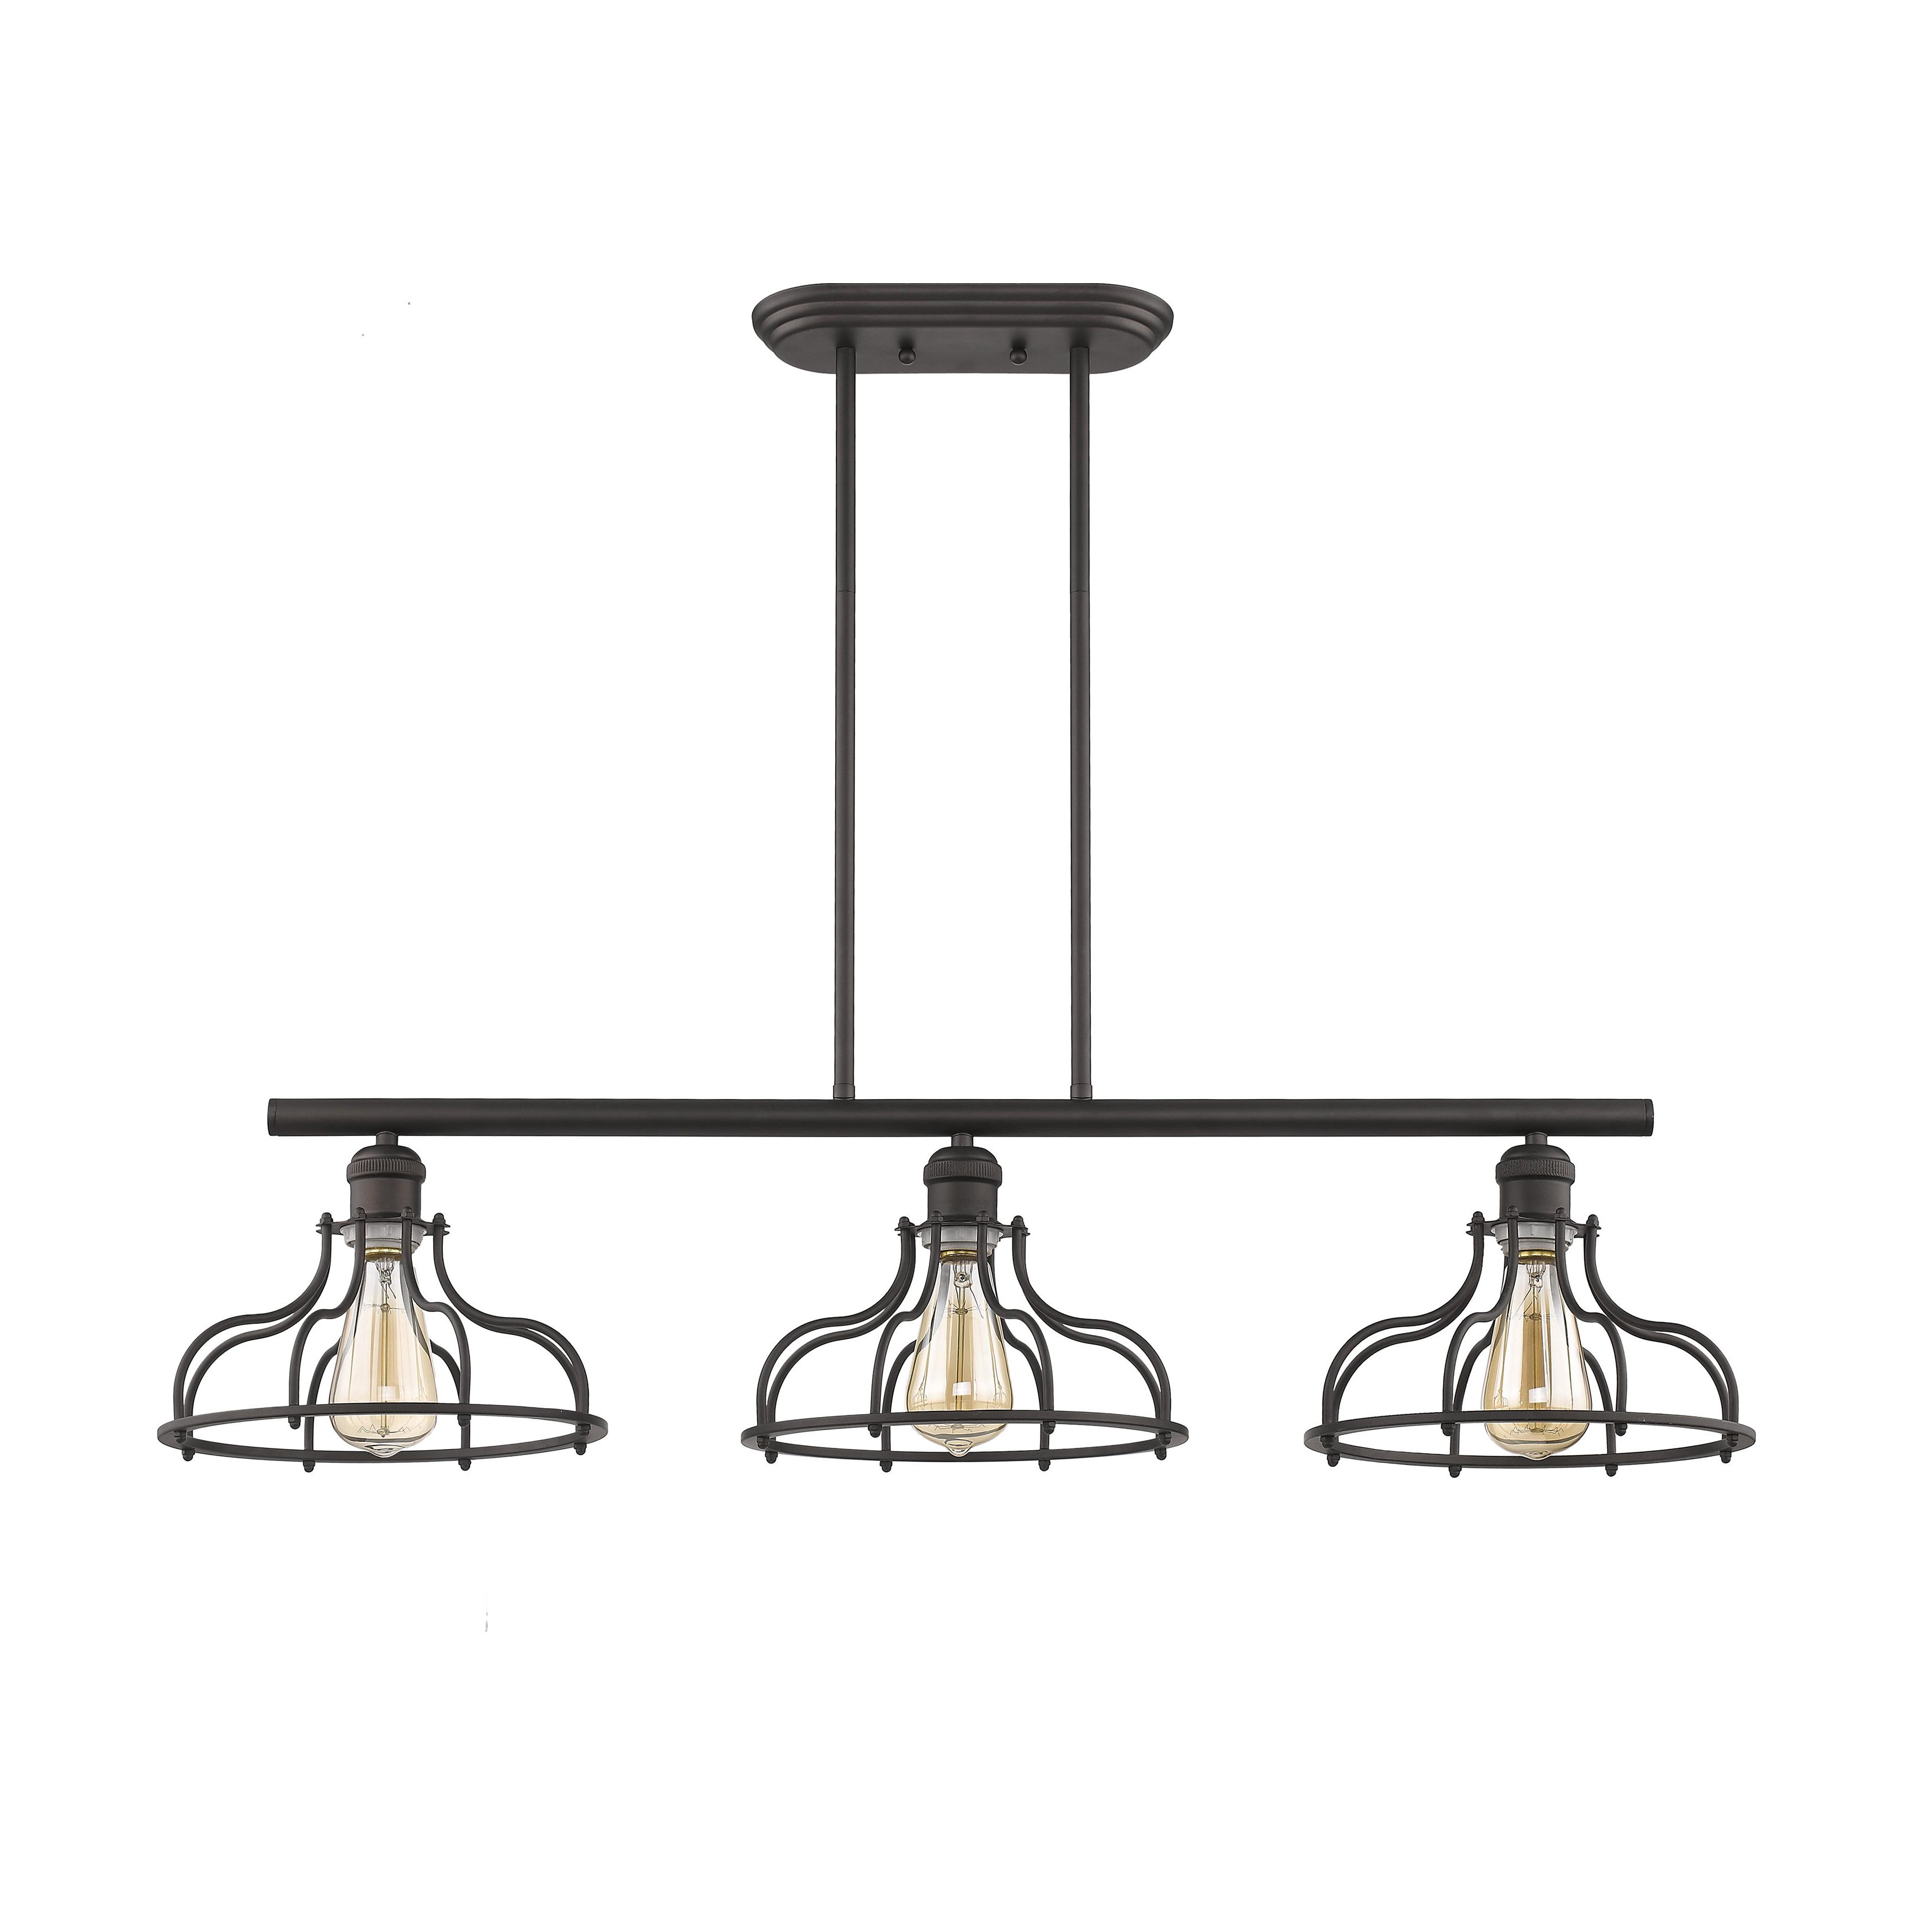 Wayfair With Regard To Akash Industrial Vintage 1 Light Geometric Pendants (View 6 of 25)